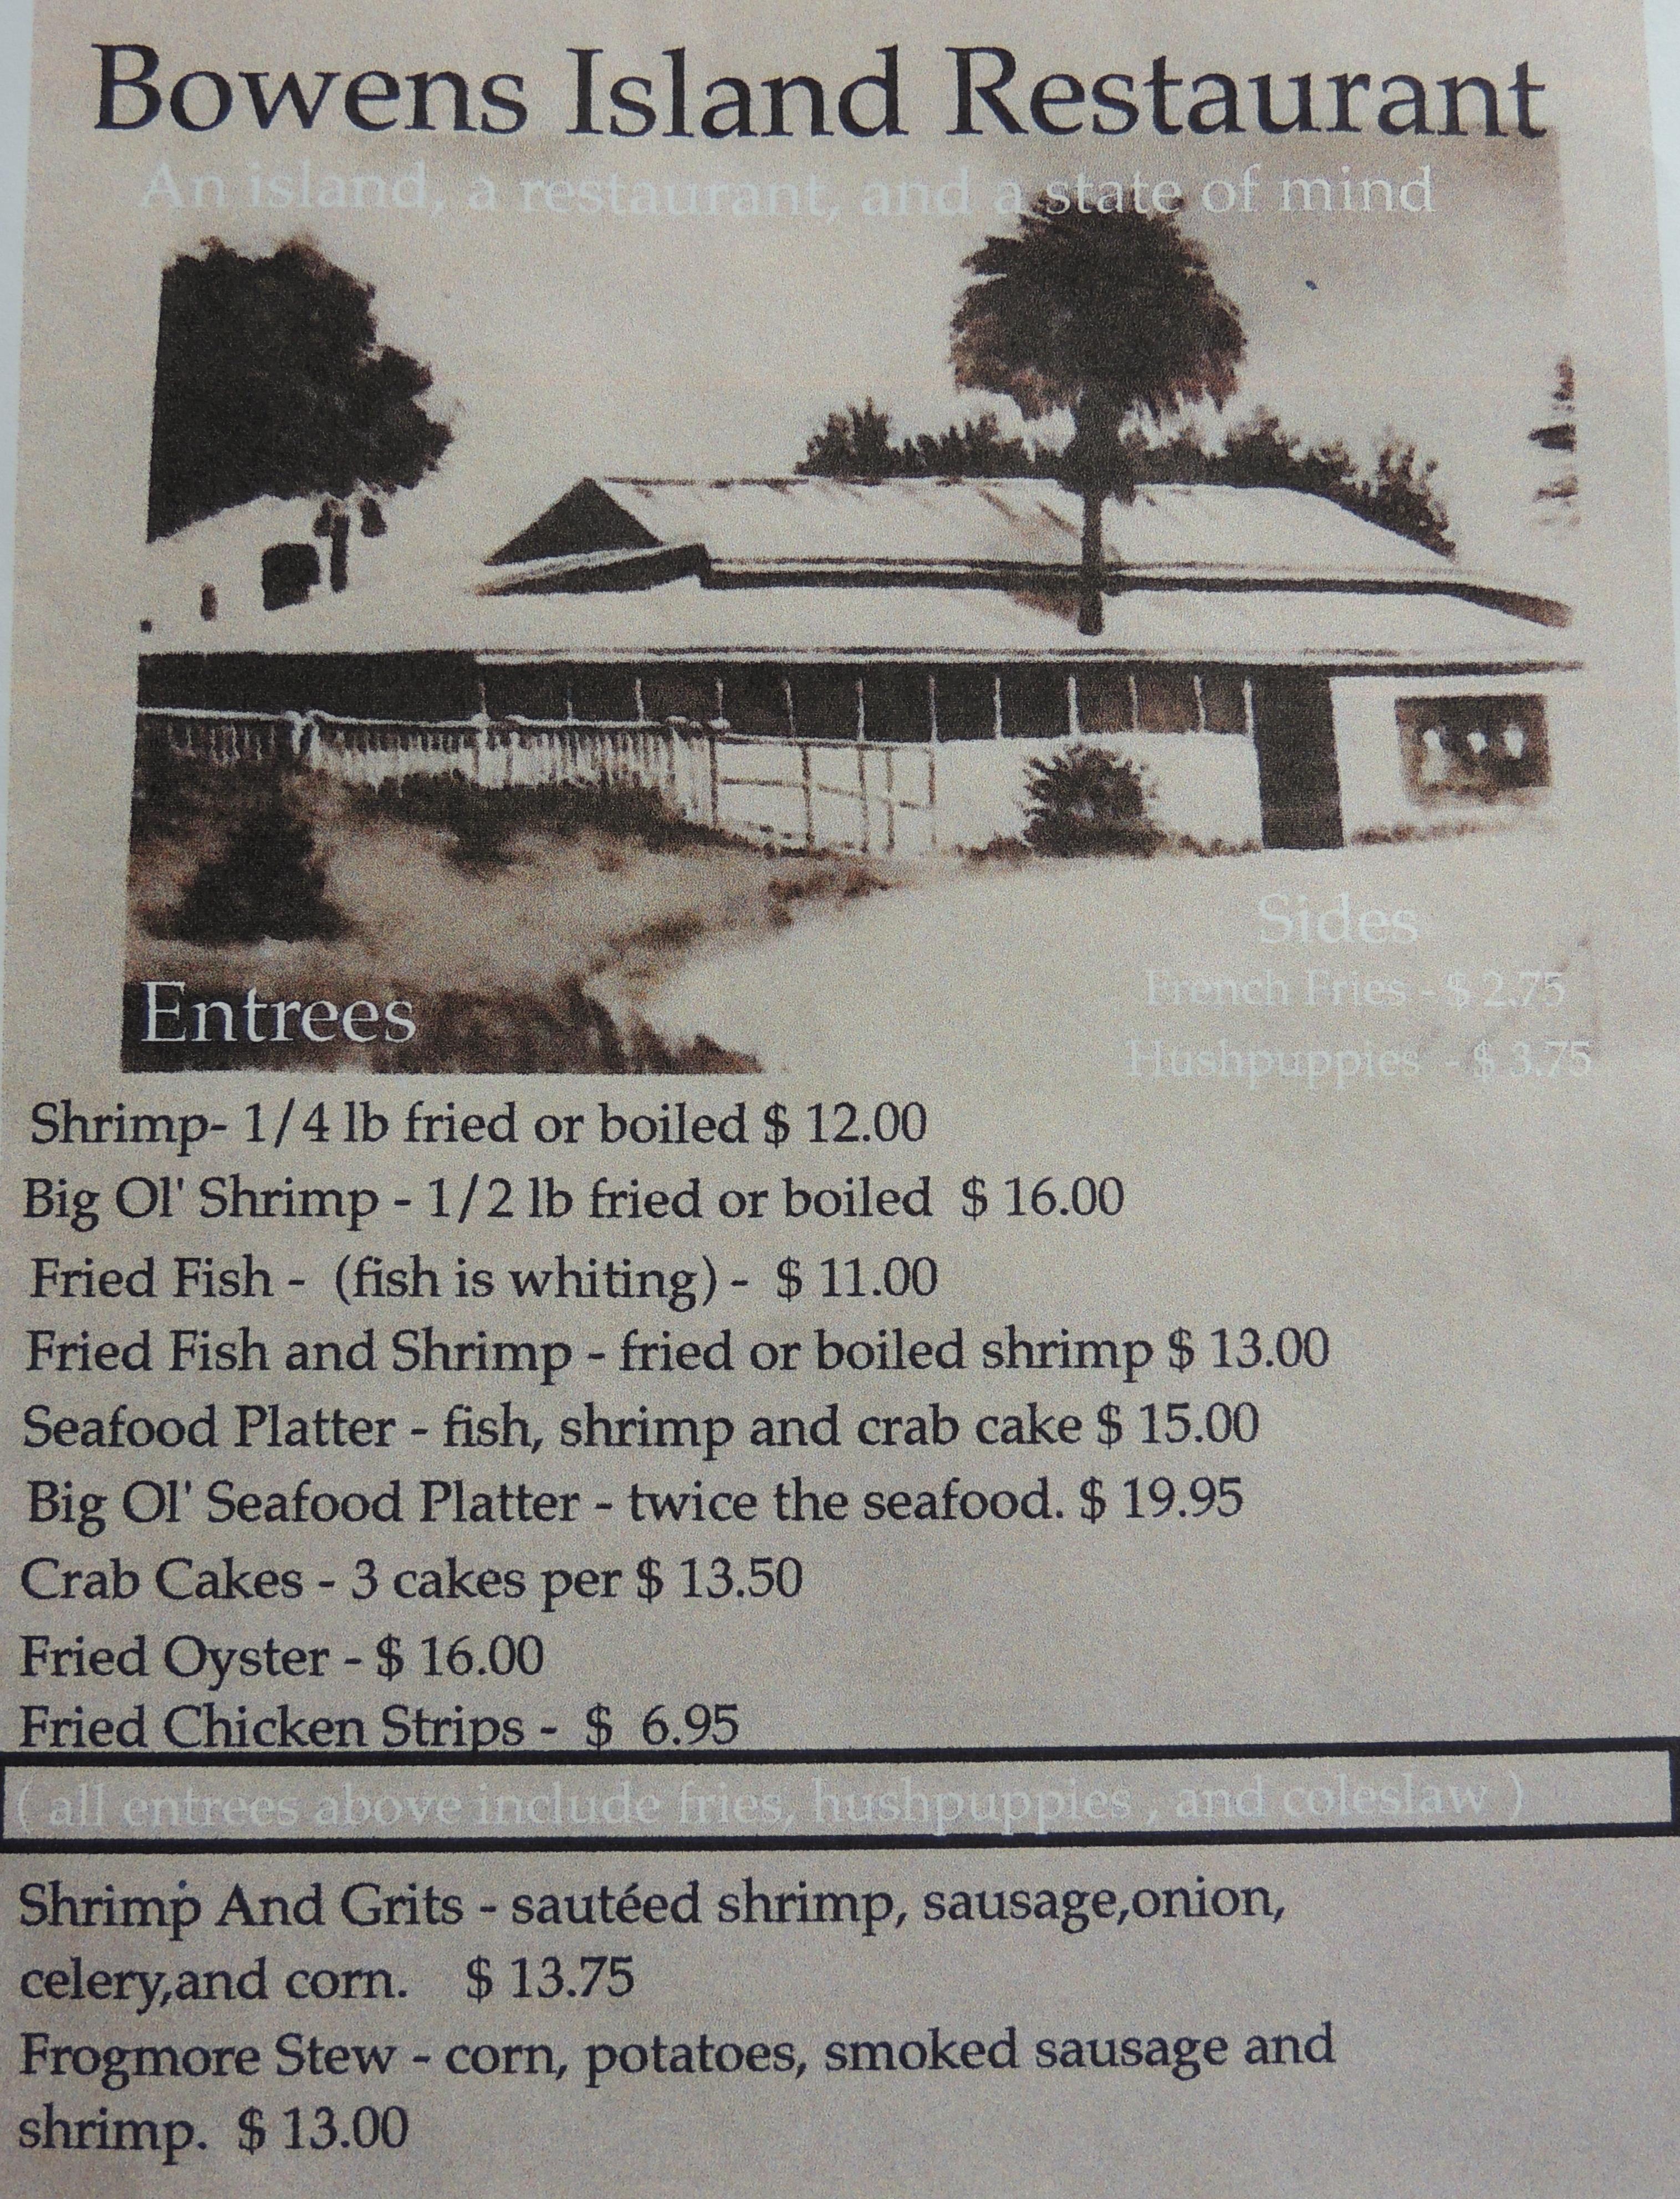 Bowens Island Restaurant Menu